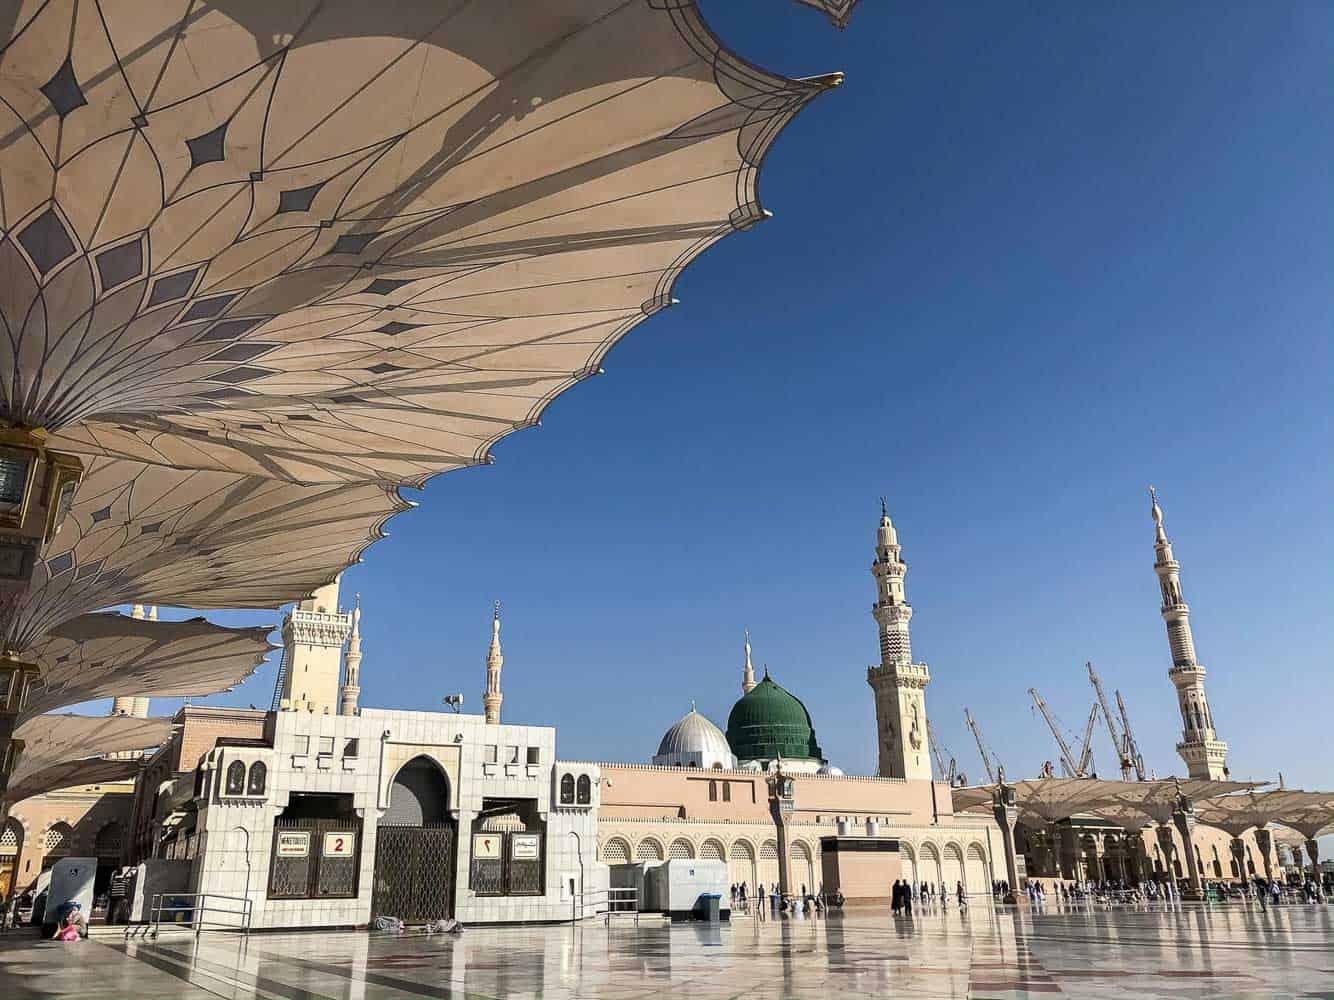 GRAND MASJID in Saudi Arabia